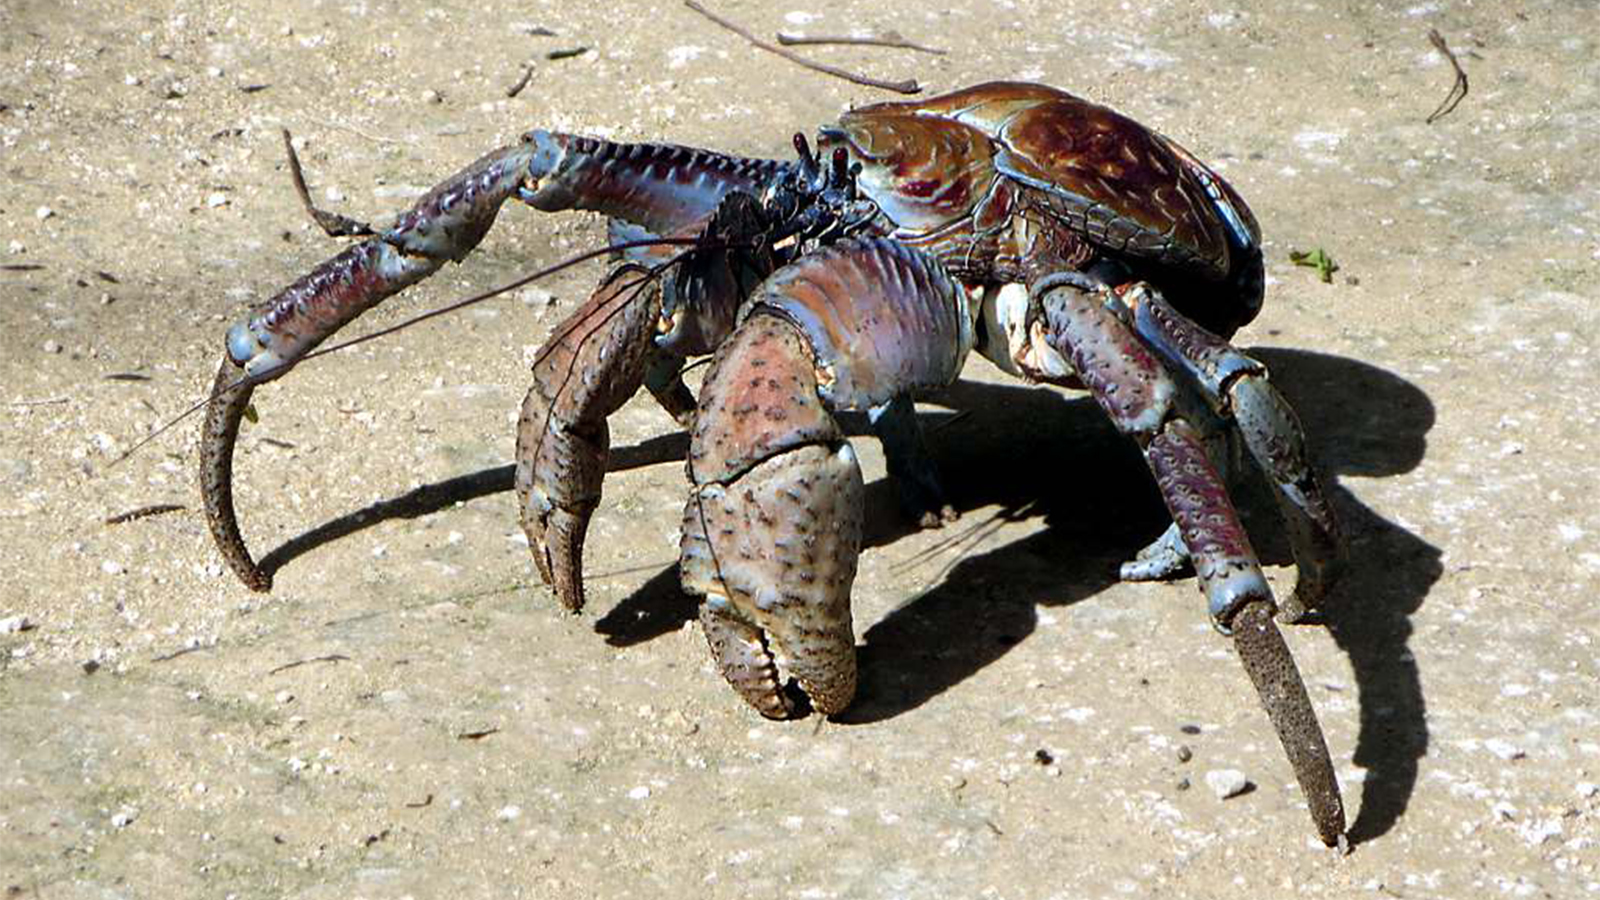 Coconut Crabs: Crustaceans on Steroids